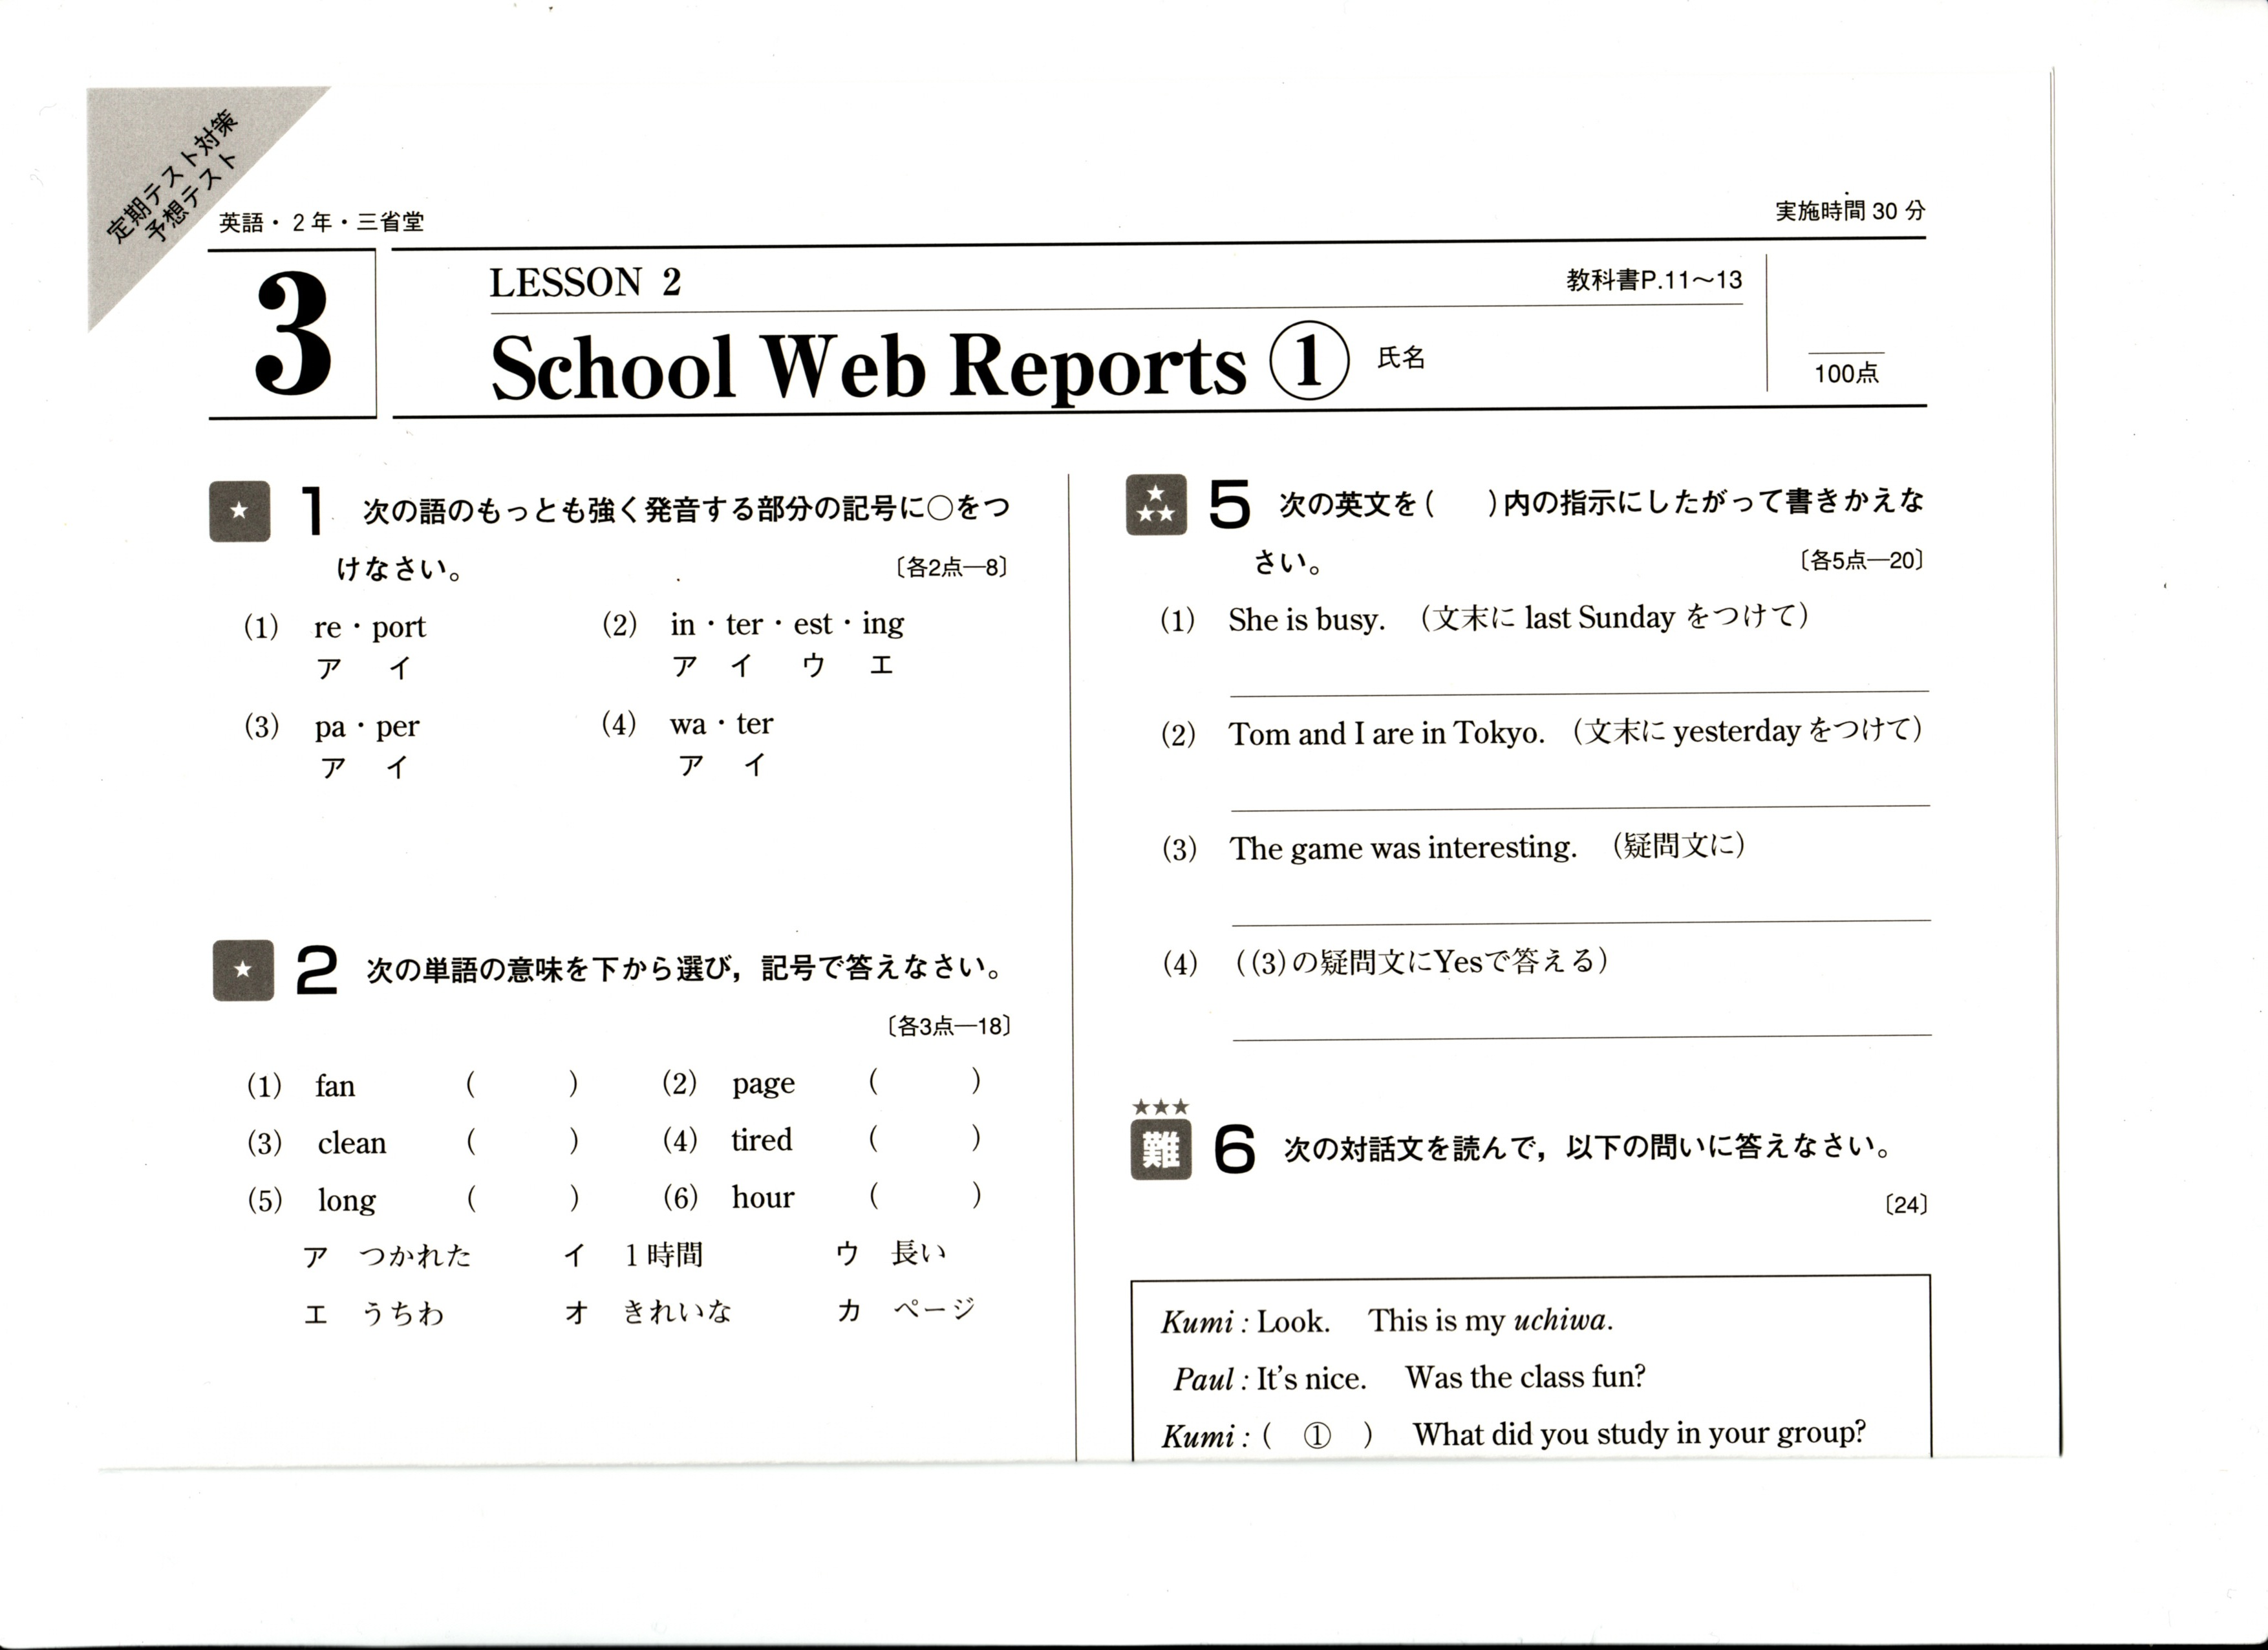 定期テスト対策予想テスト(中 ... : 英語教材 小学生 : 小学生